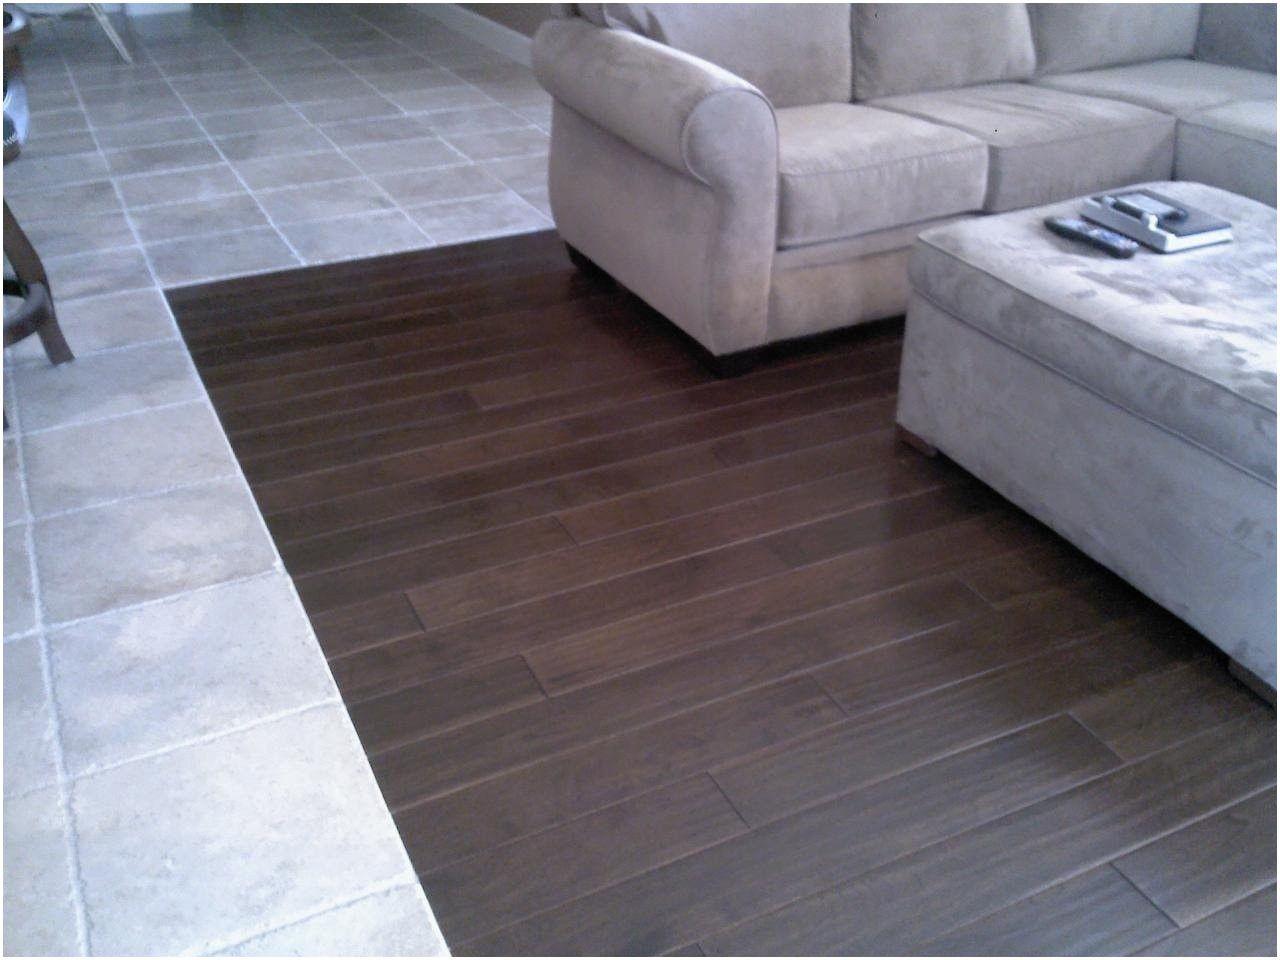 hardwood tile flooring of wood effect floor tiles wood effect porcelain tiles in wood effect floor tiles wood floor tiles wood floor tiles cientouno